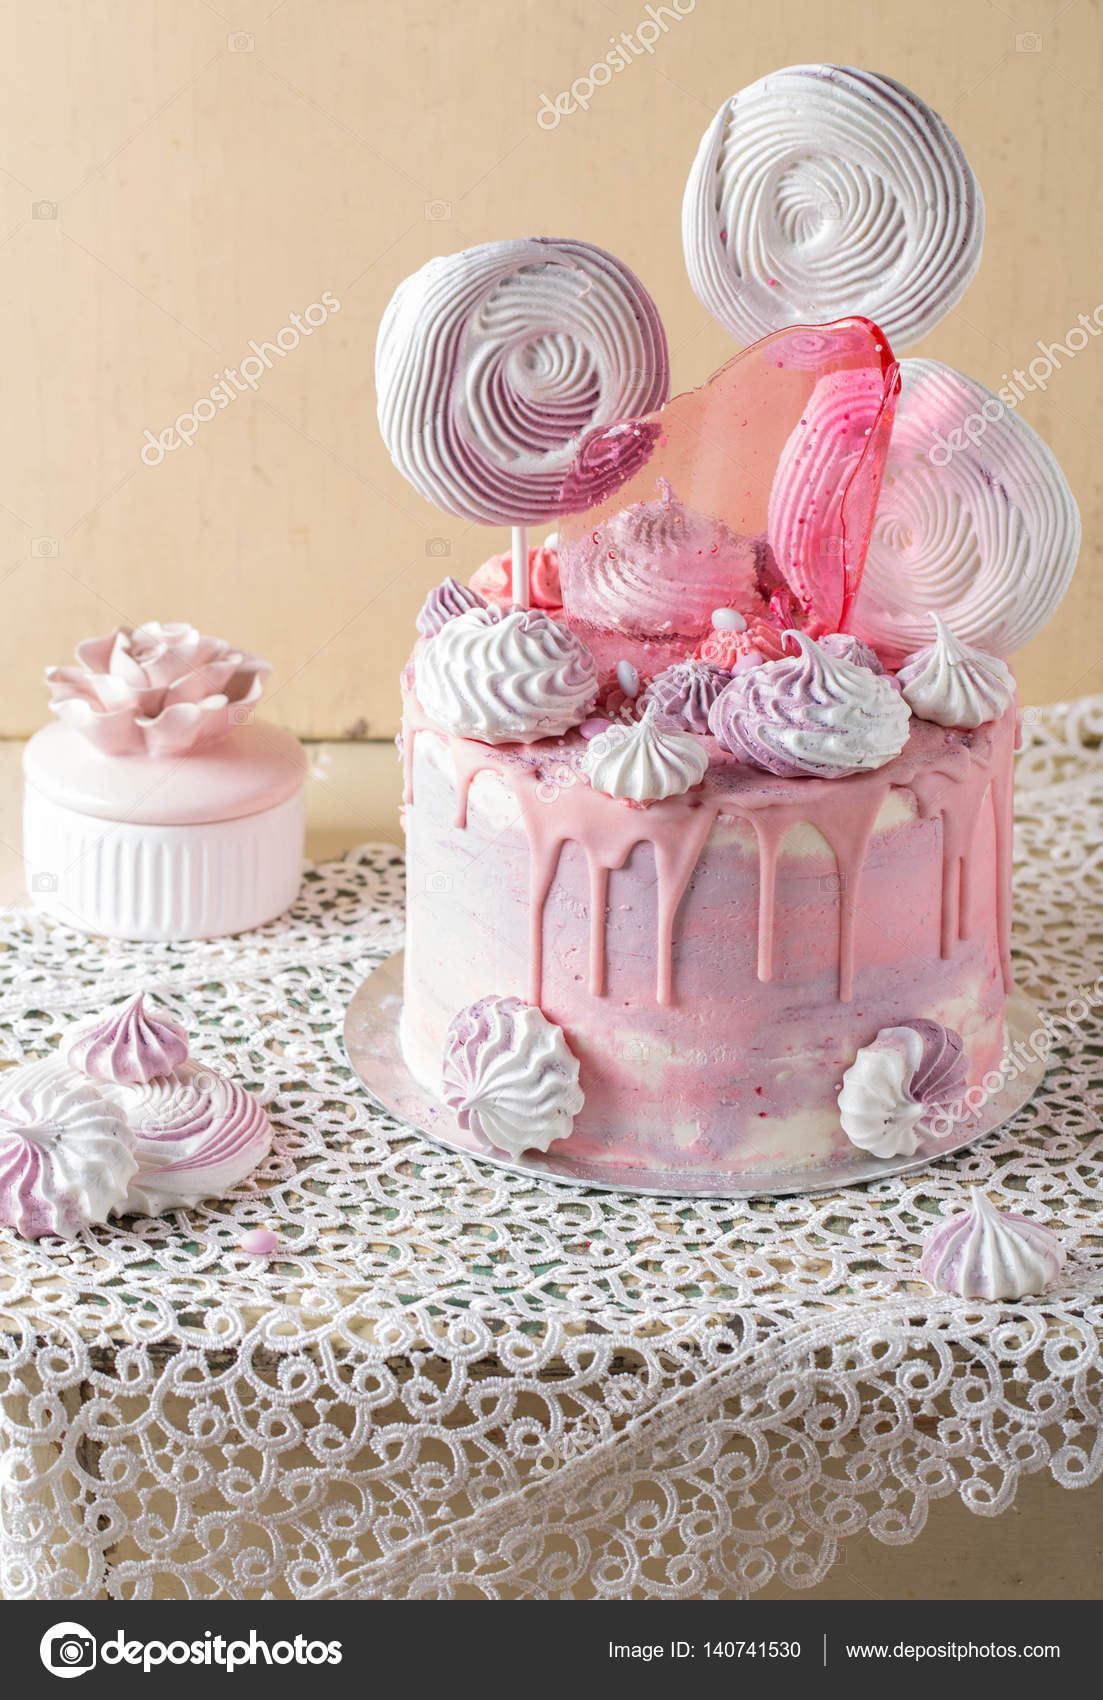 Tremendous Pink And Violet Fancy Birthday Cake Stock Photo C Teelesswonder Funny Birthday Cards Online Alyptdamsfinfo